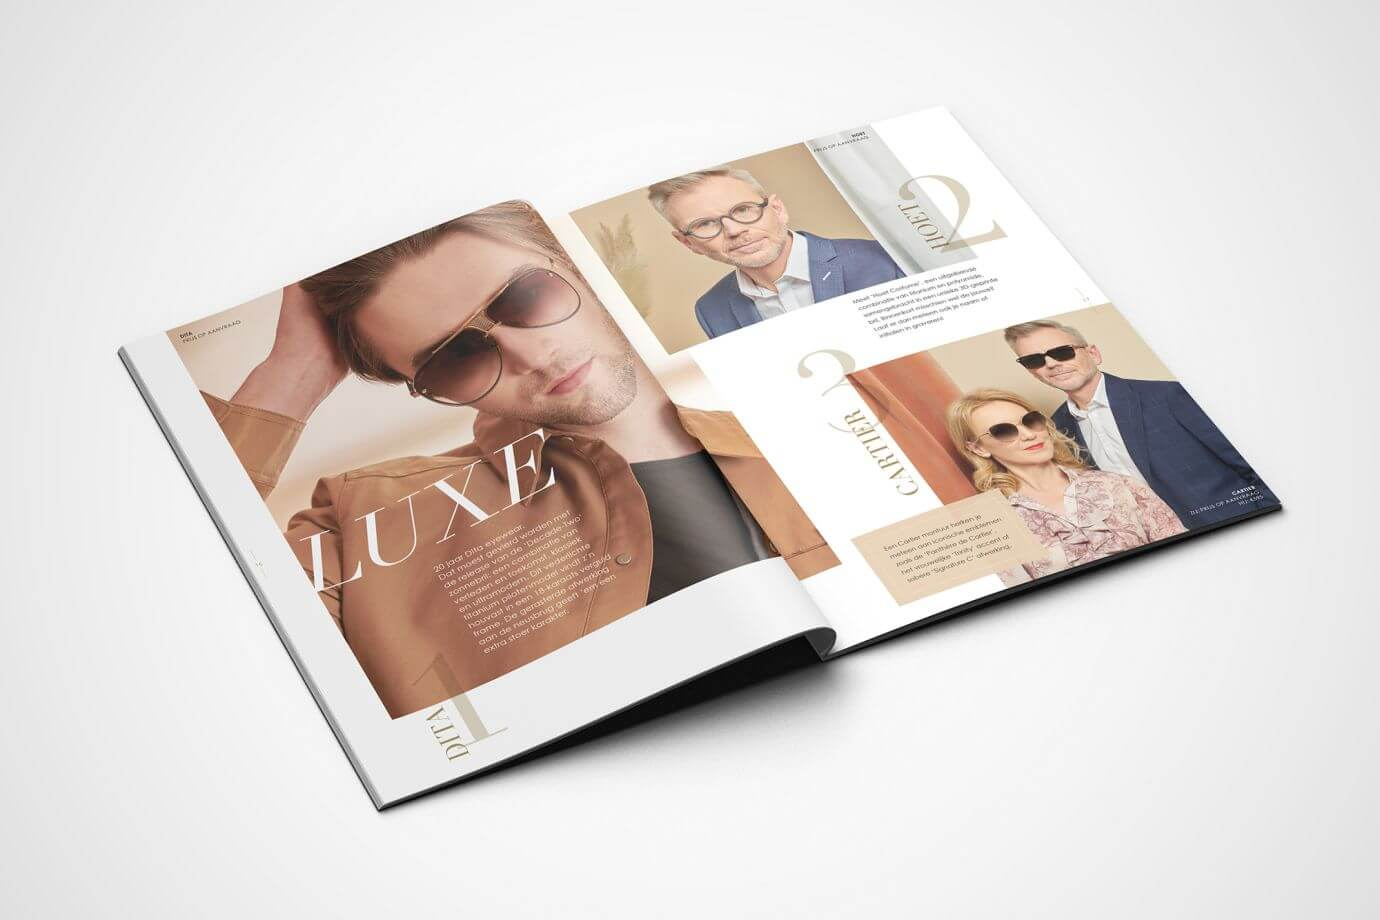 Lammerant magazine